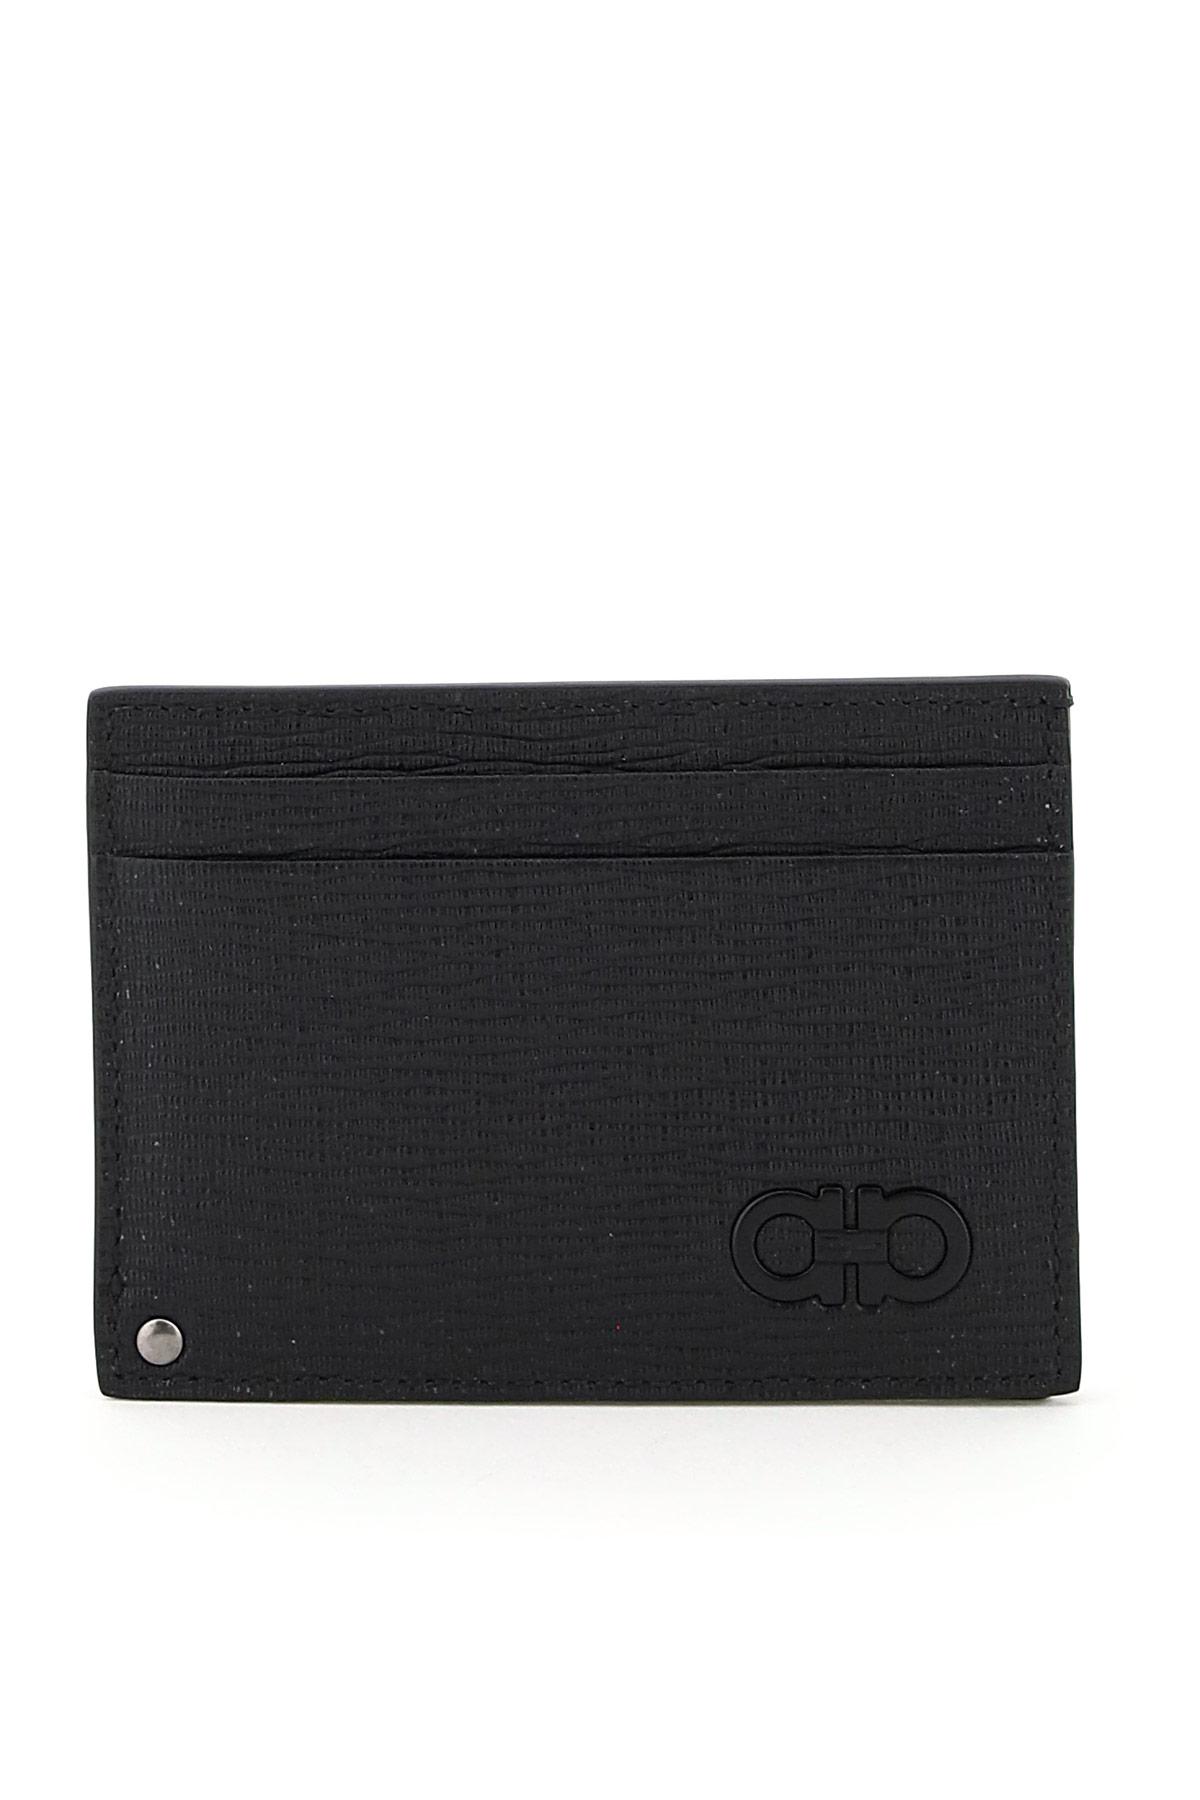 SALVATORE FERRAGAMO CREDIT CARD HOLDER OS Black, Grey Leather